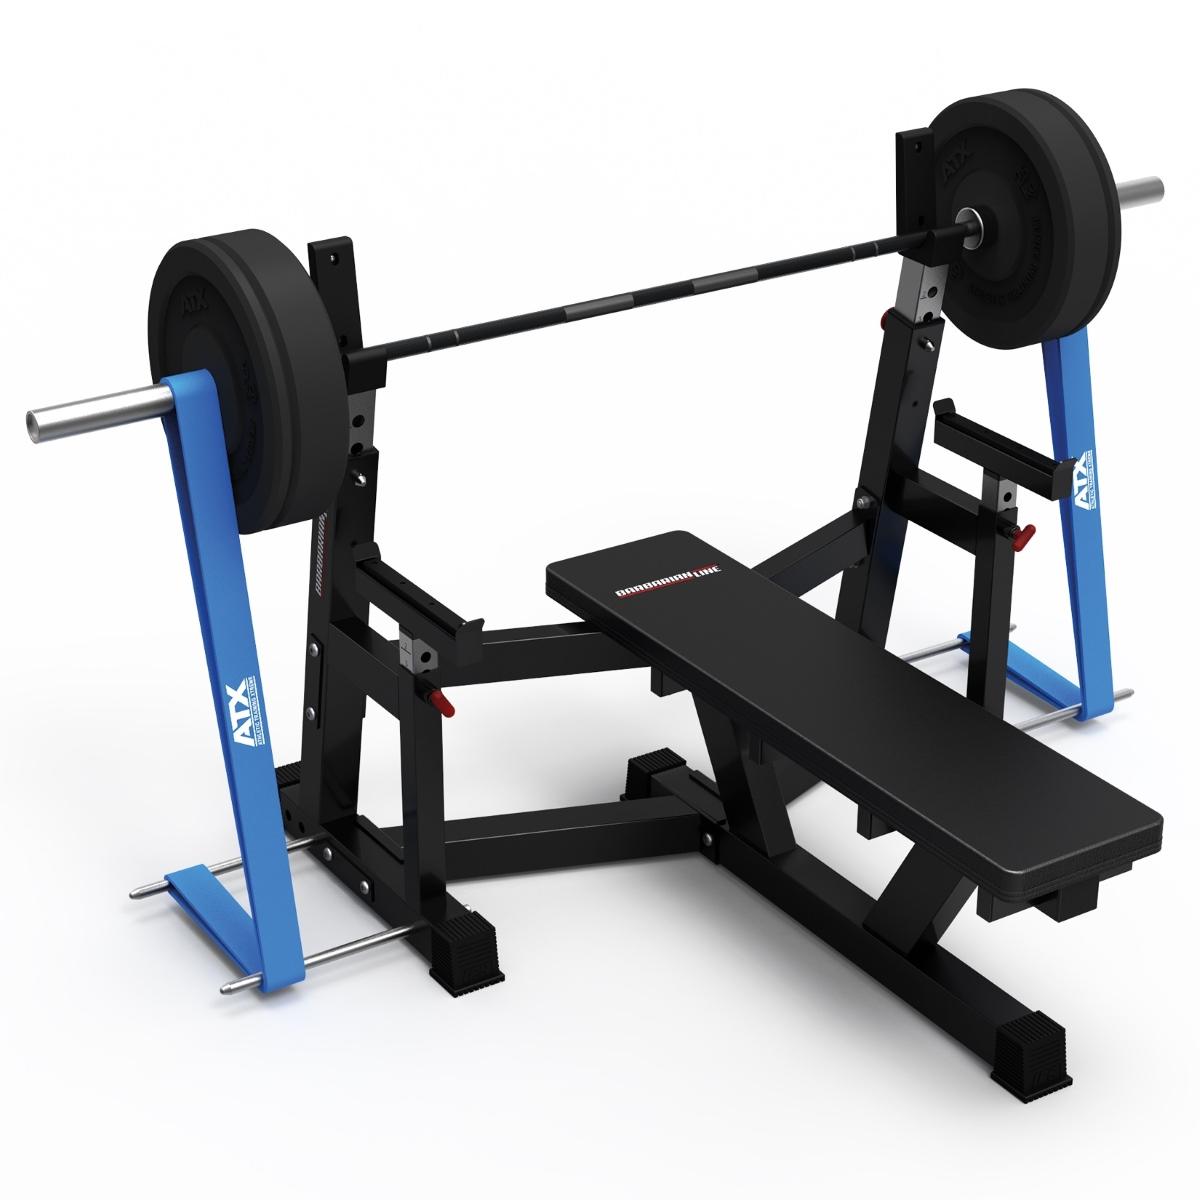 press gym bench qatar title workout living for urgent sale node